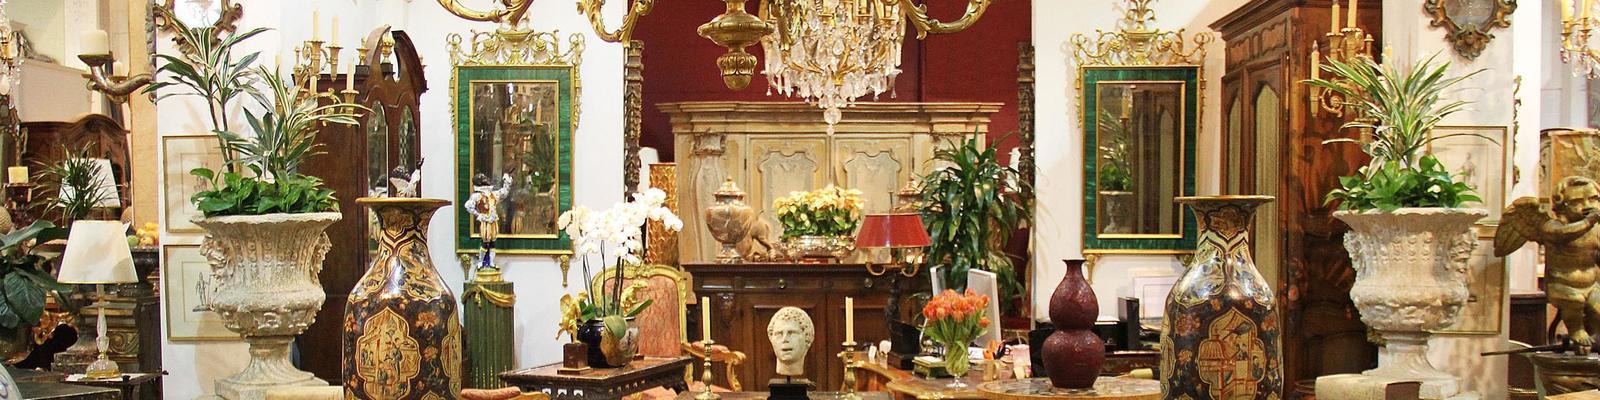 C. Mariani Antiques, Restoration & Custom background